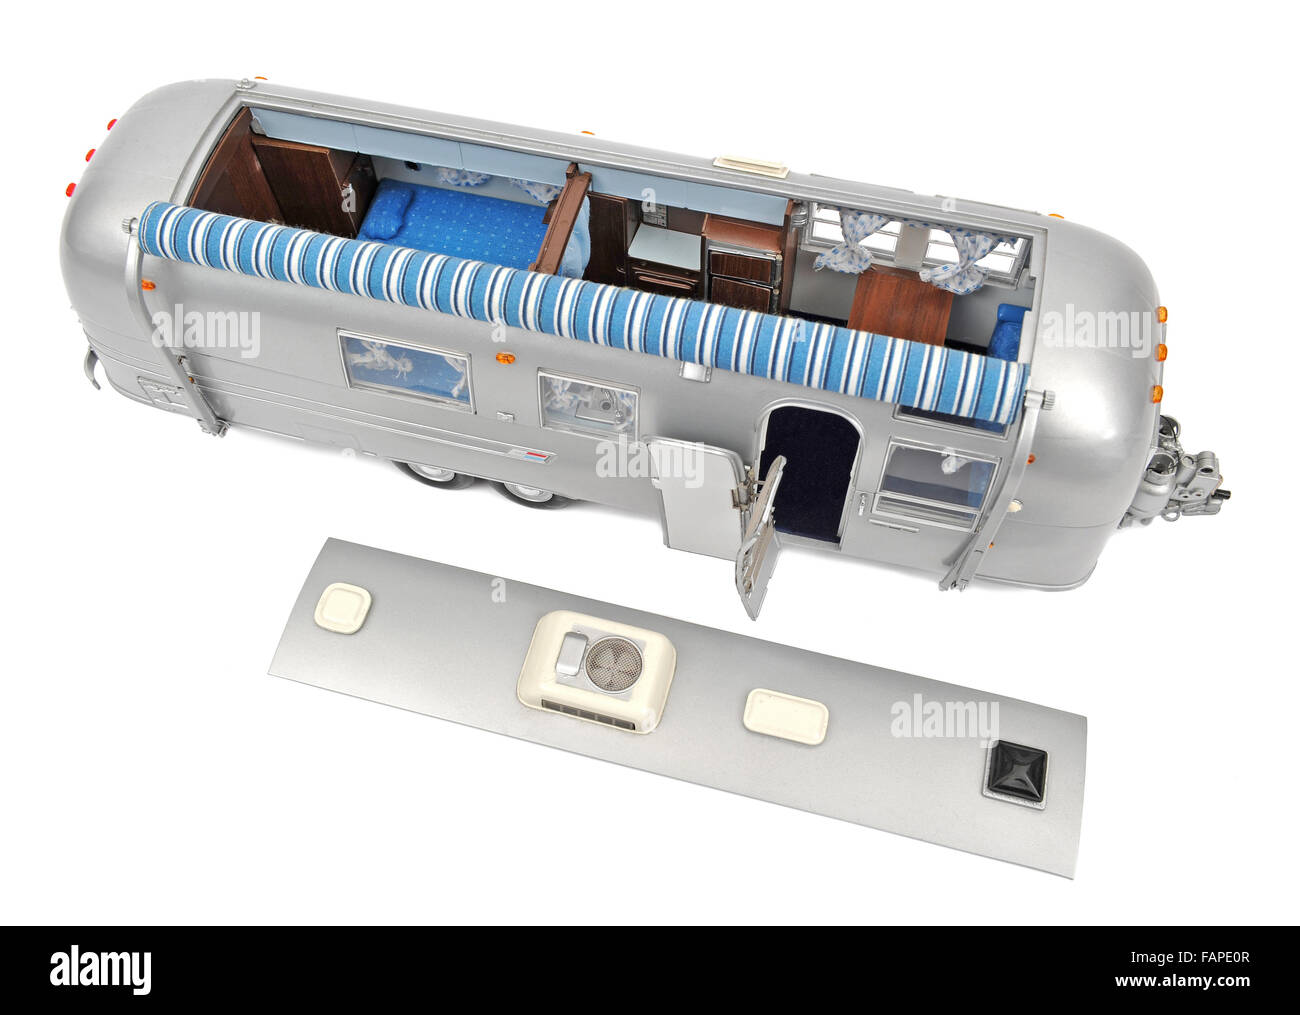 Children's Airstream Overlander touring caravan scale model toy - Stock Image